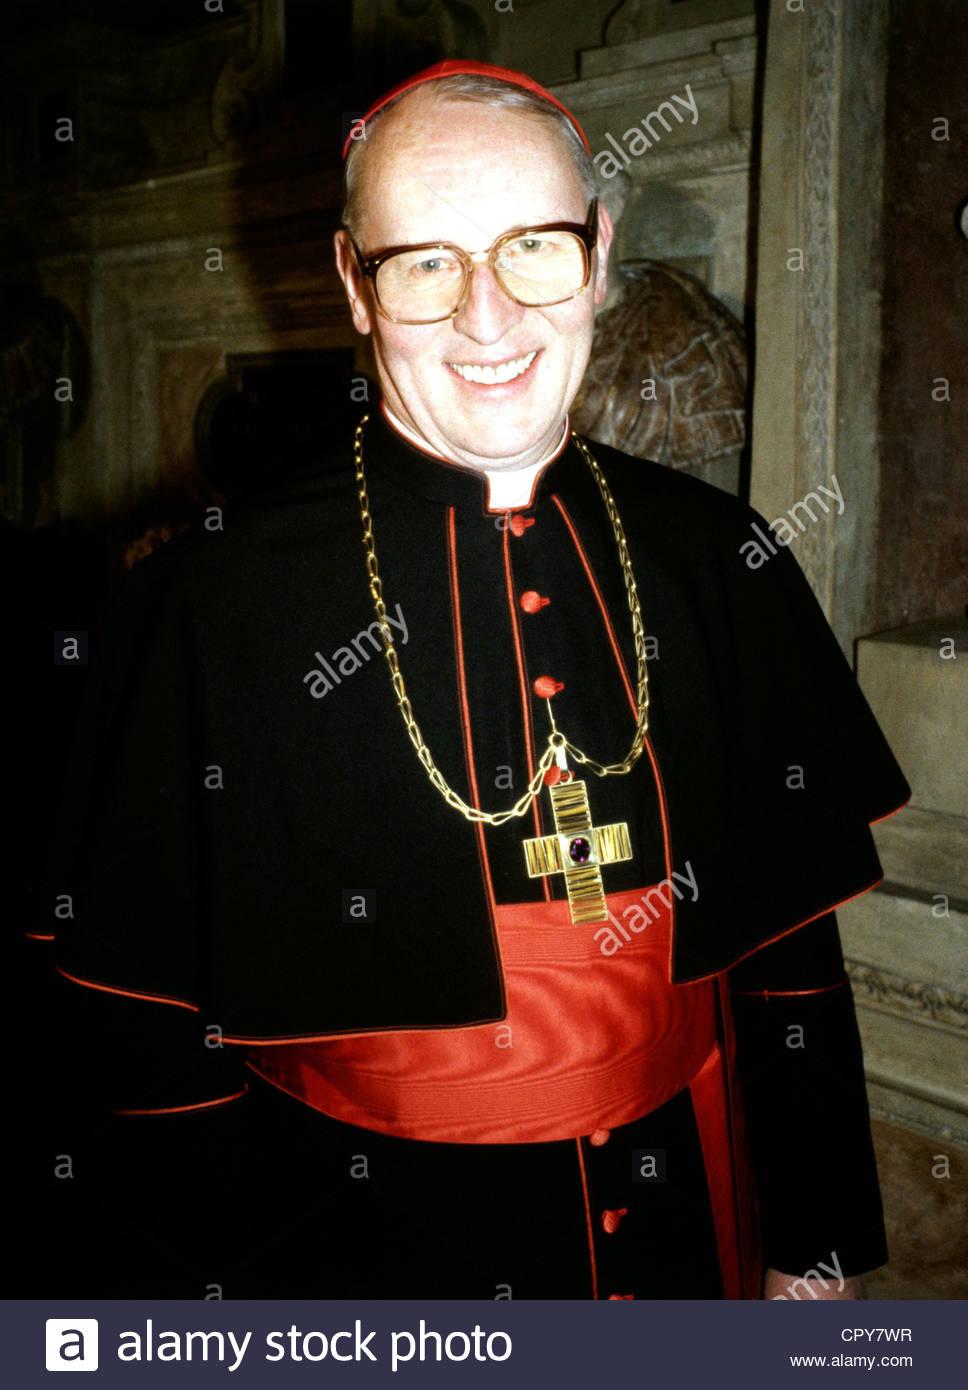 Wetter, Friedrich, Kardinal, * 20.2.1928, German clergyman, Archbishop of Munich, half length, high official, dignitary, - Stock Image